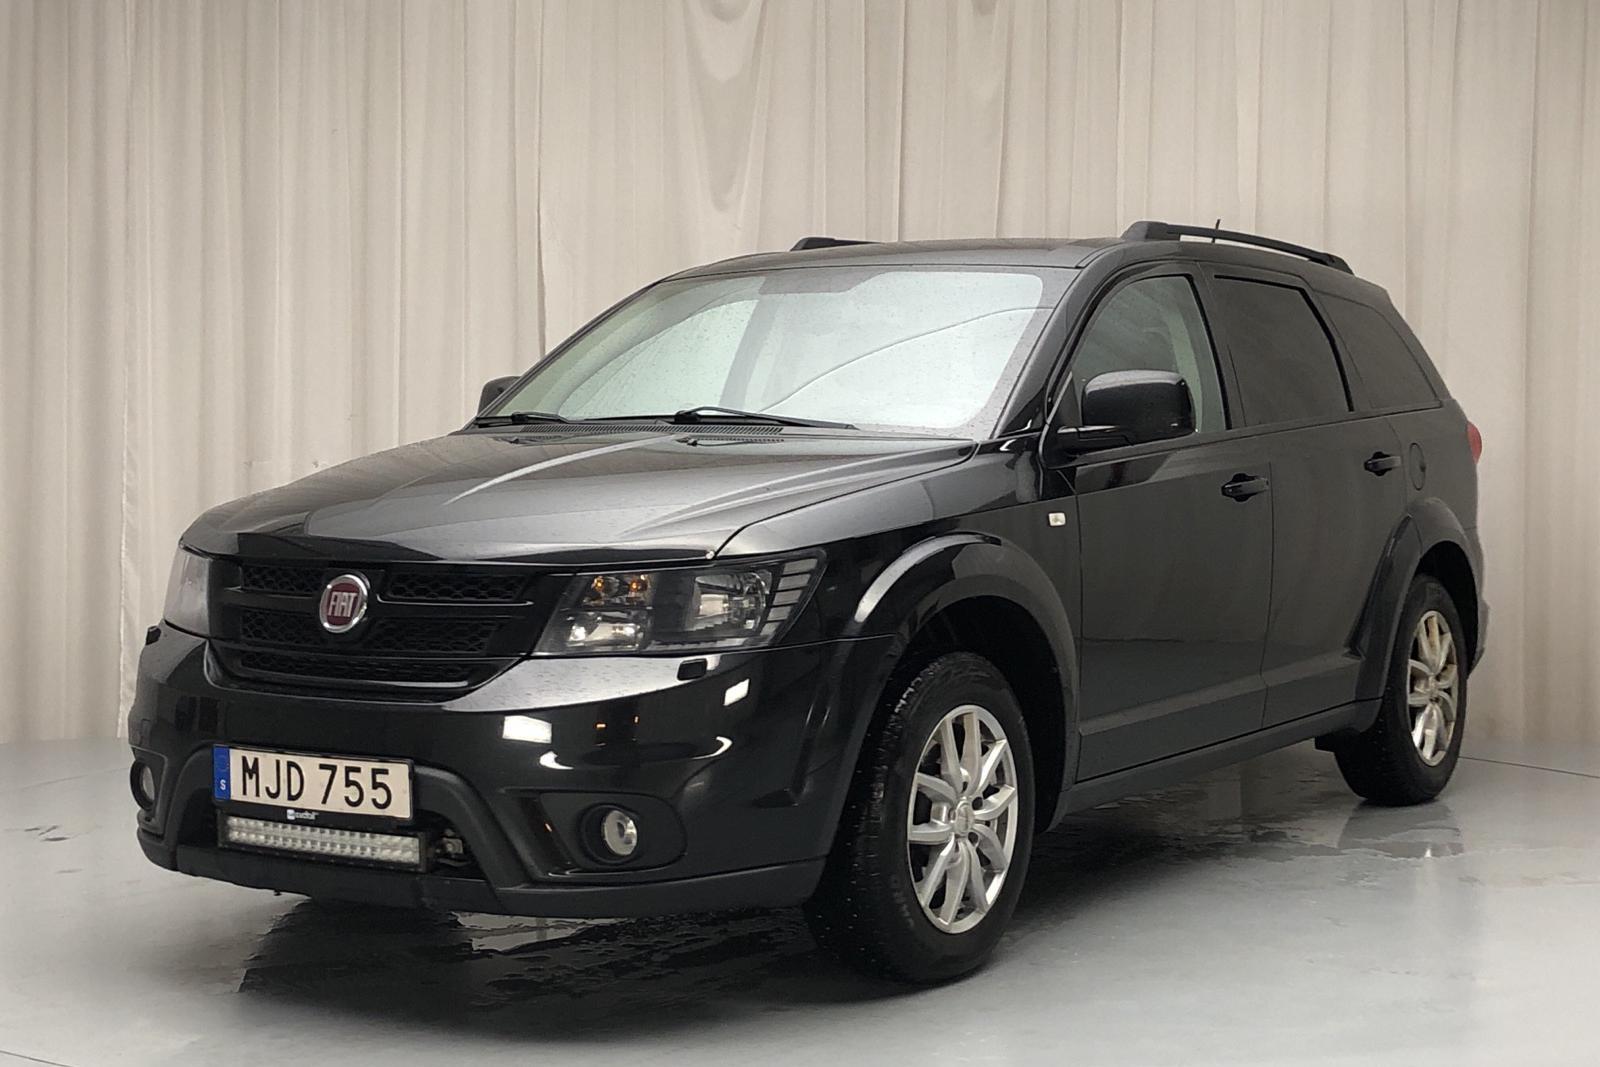 Fiat Freemont 2.0 Multijet AWD (170hk) - 16 235 mil - Automat - svart - 2014